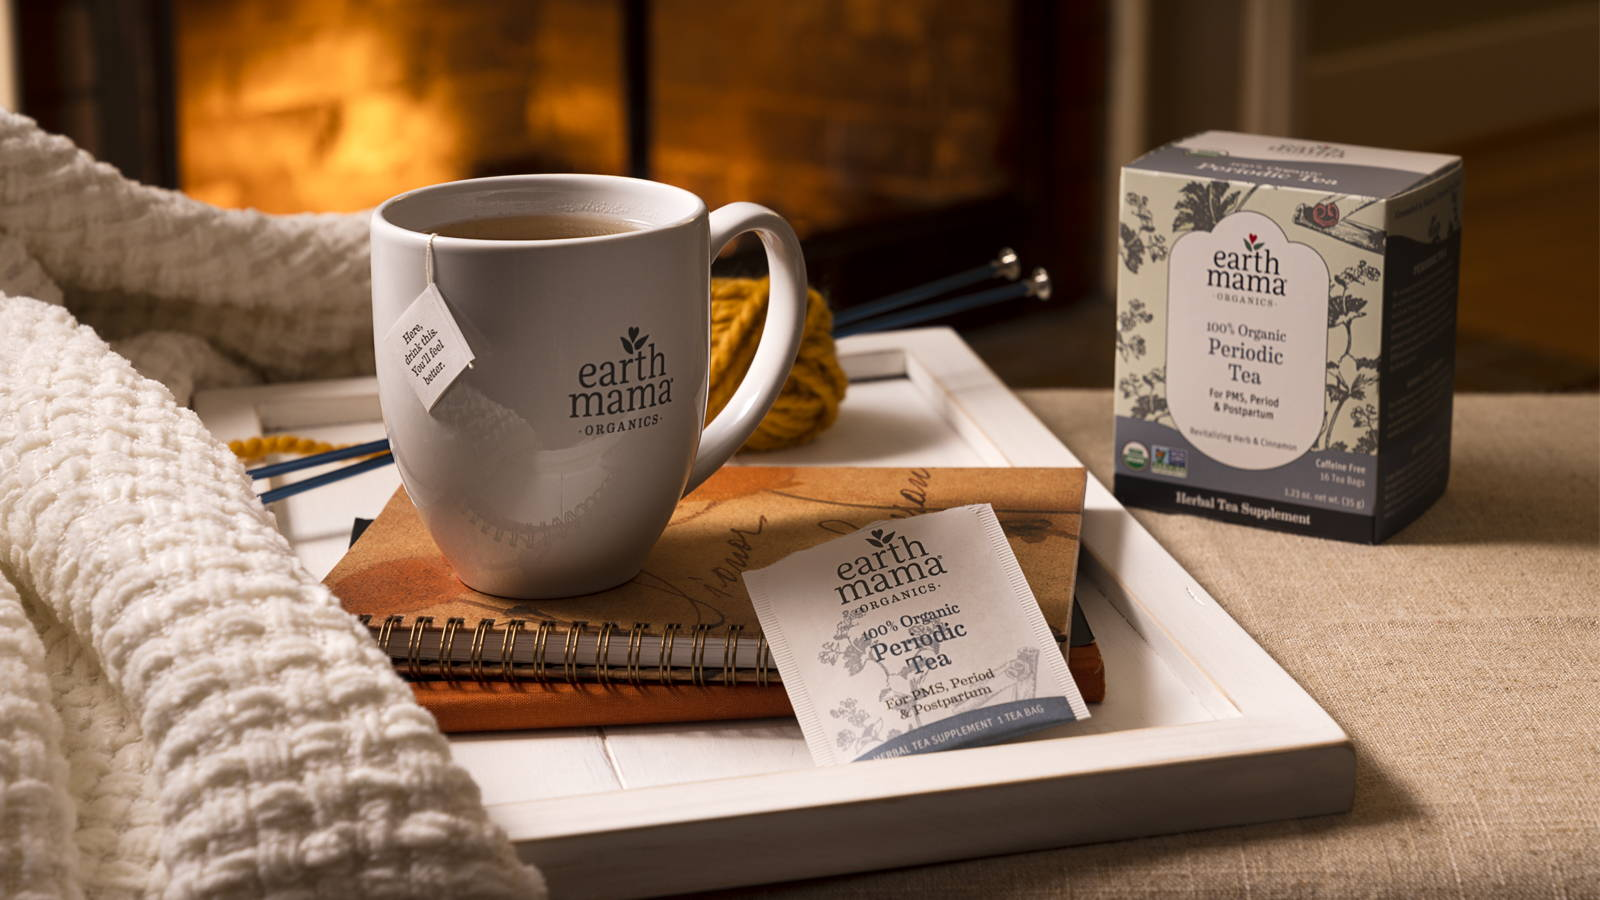 Organic Periodic Tea